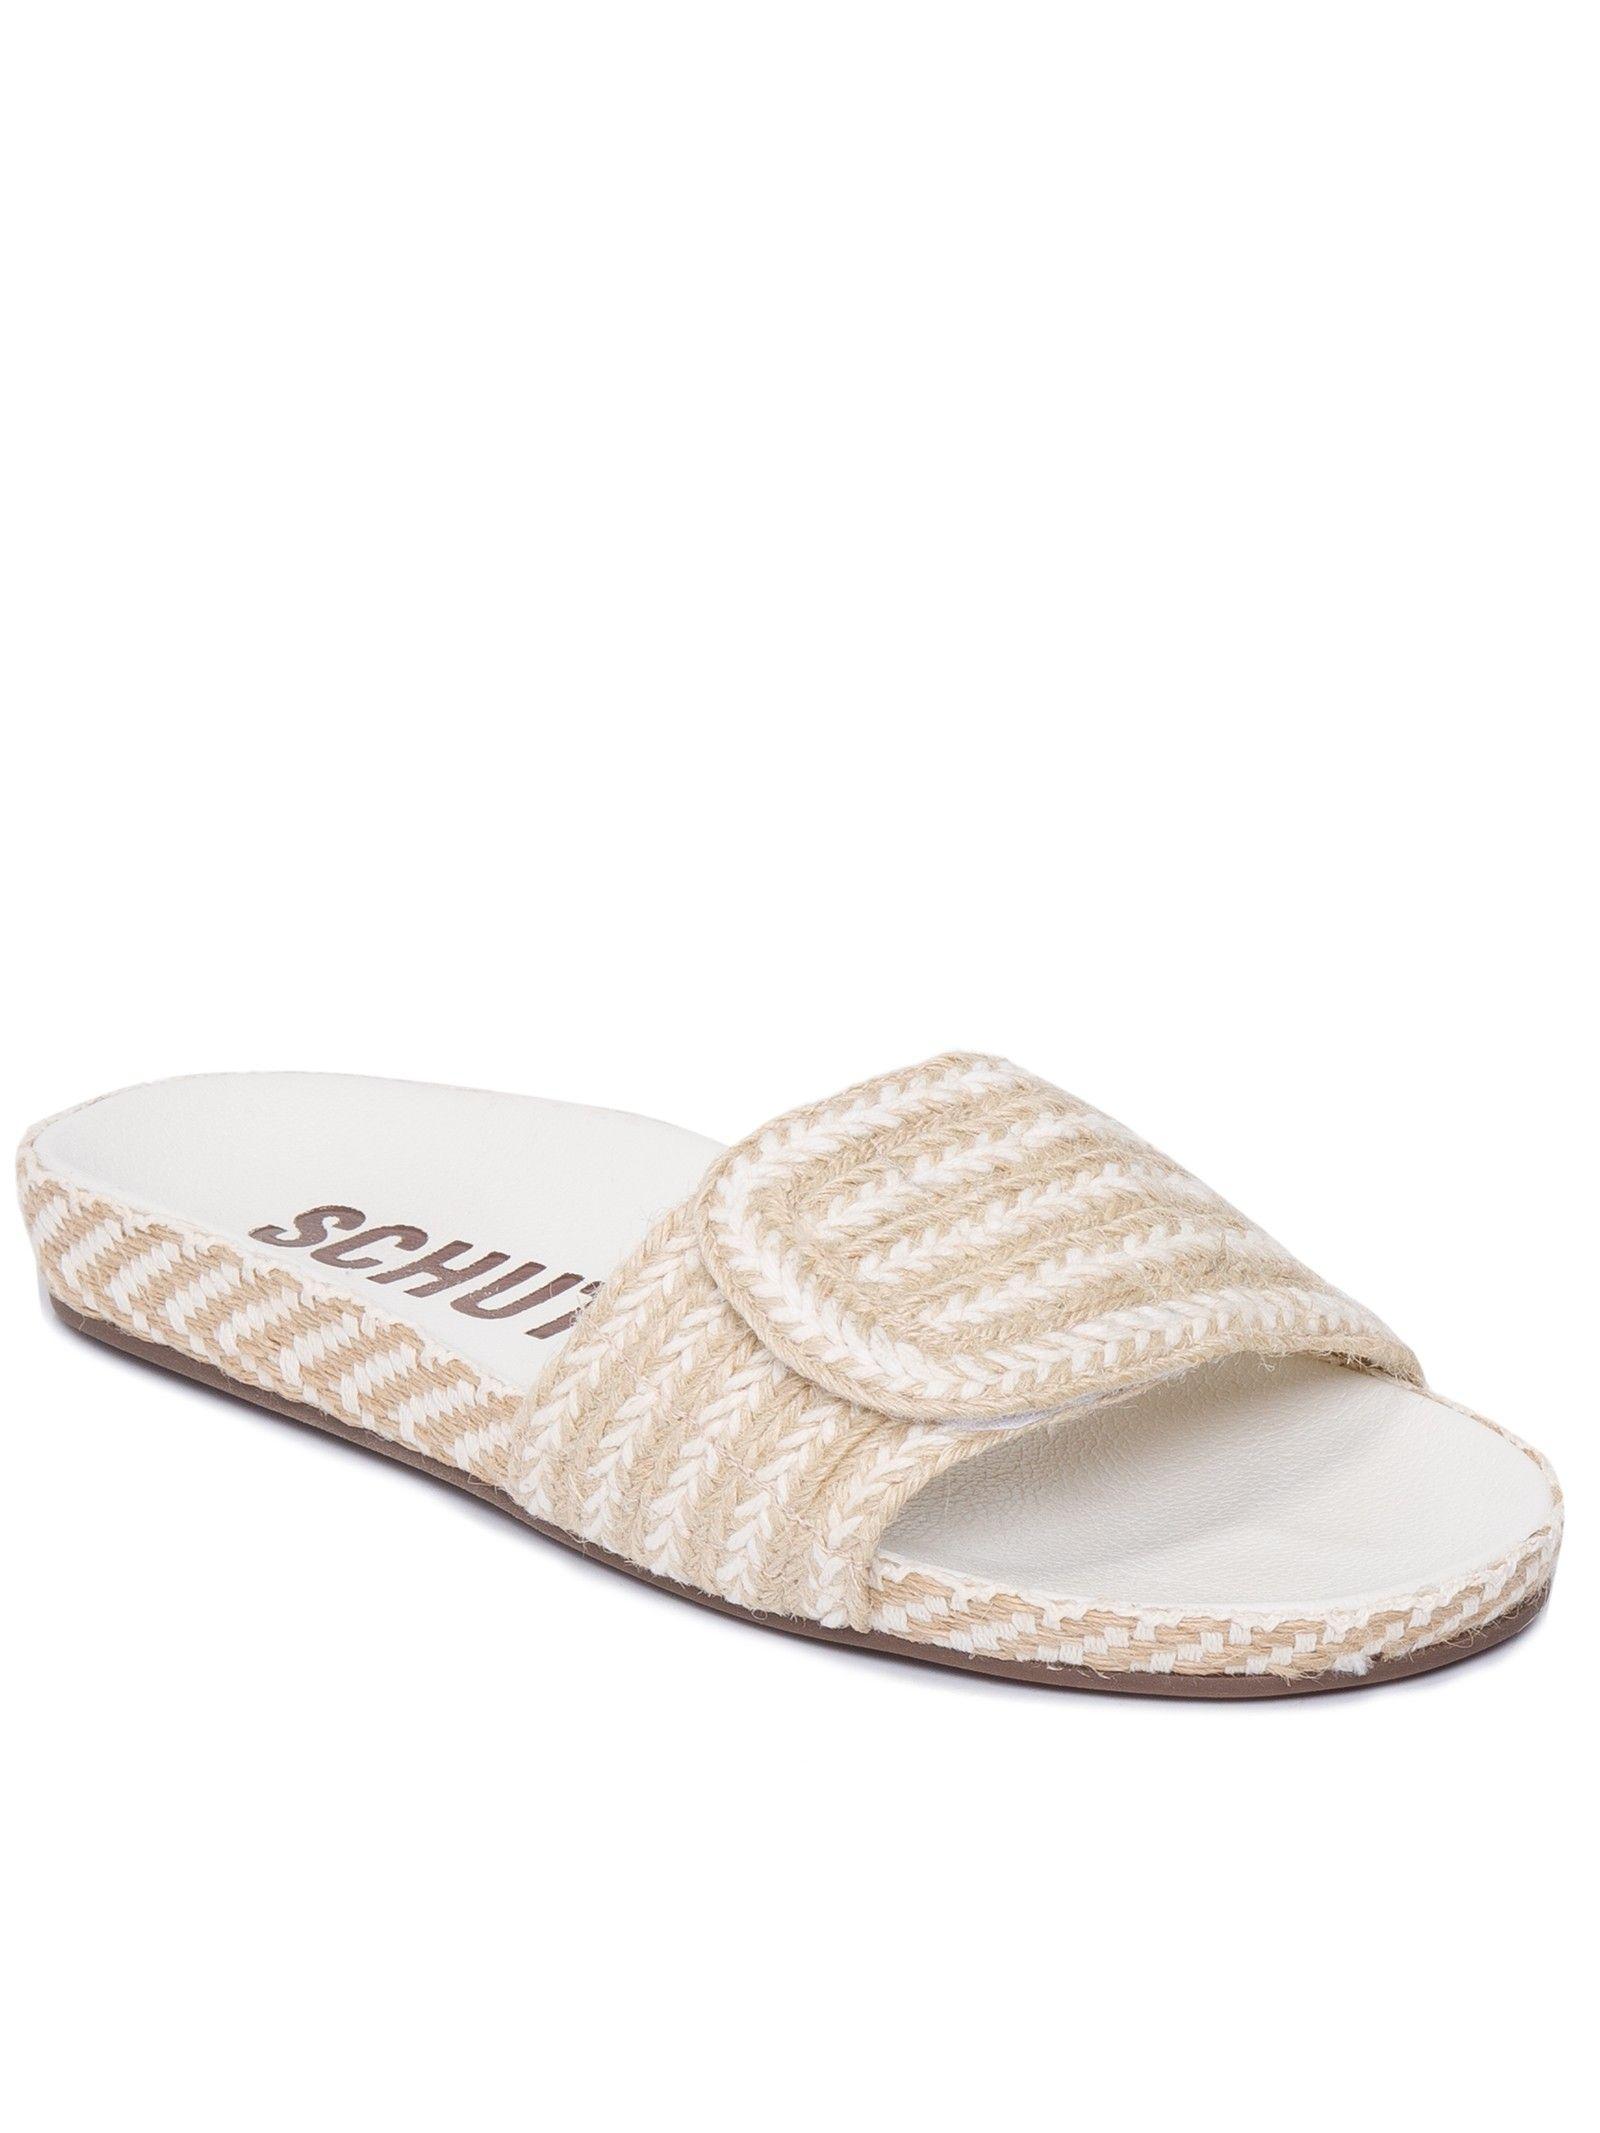 7c0255620 Sandália Feminina Slide High Summer - Schutz - Bege - Shop2gether ...